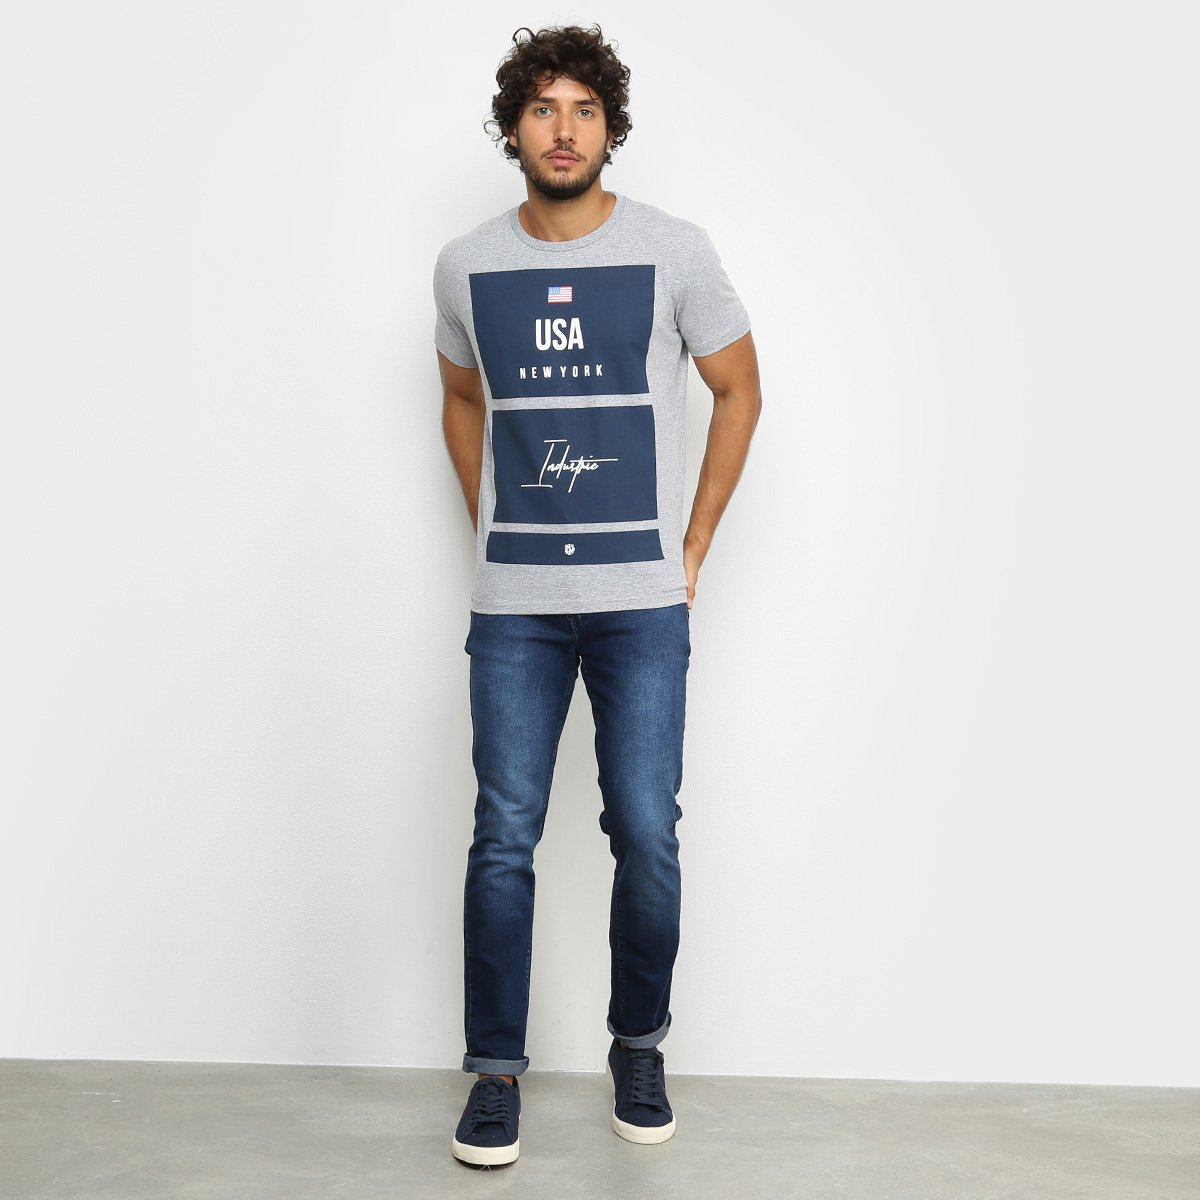 Camiseta Industrie New York Masculina - Mescla